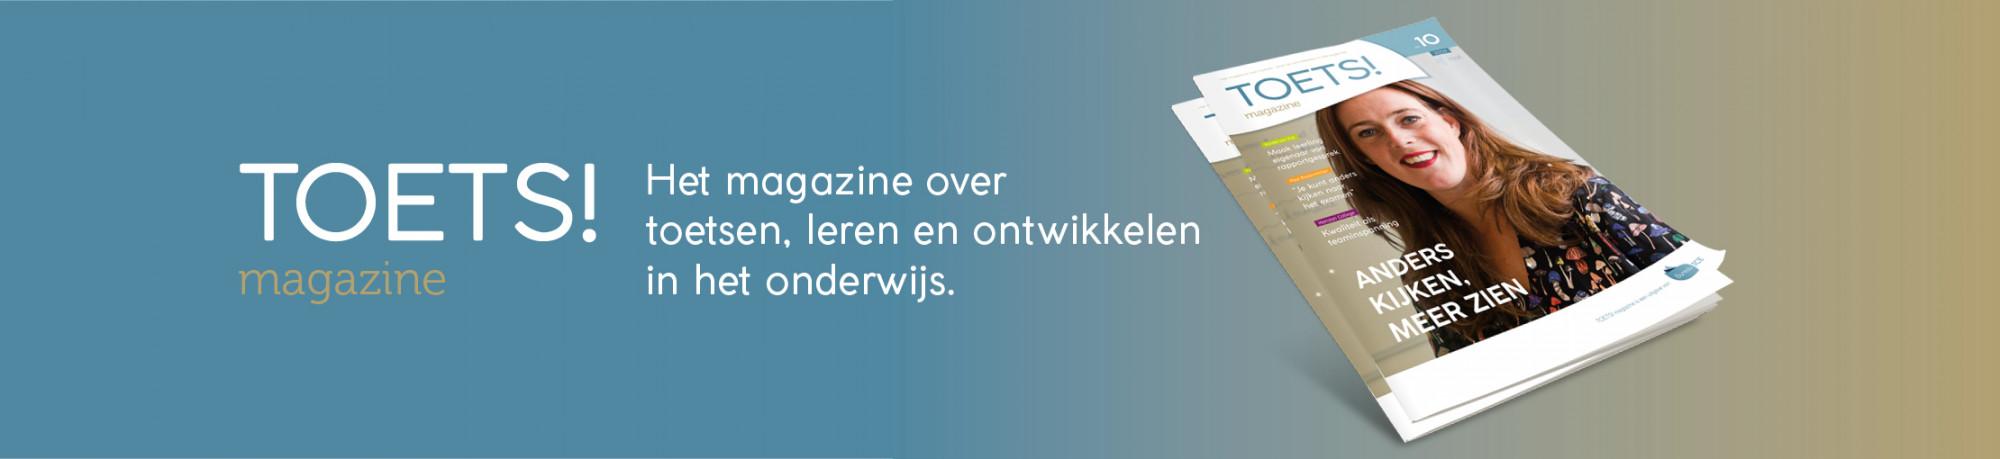 Toets magazine